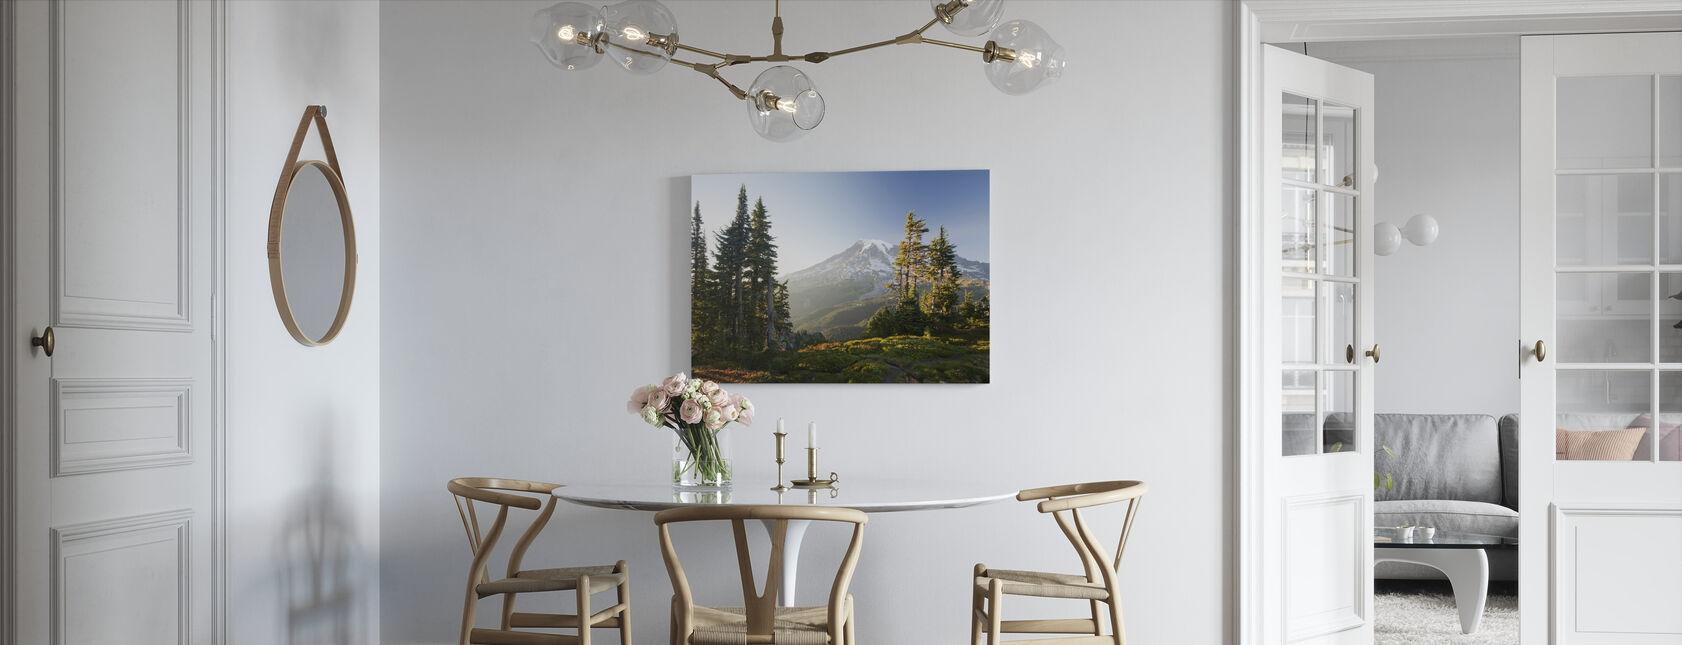 Mount Rainier and Alpine Forest at Sunset - Canvas print - Kitchen